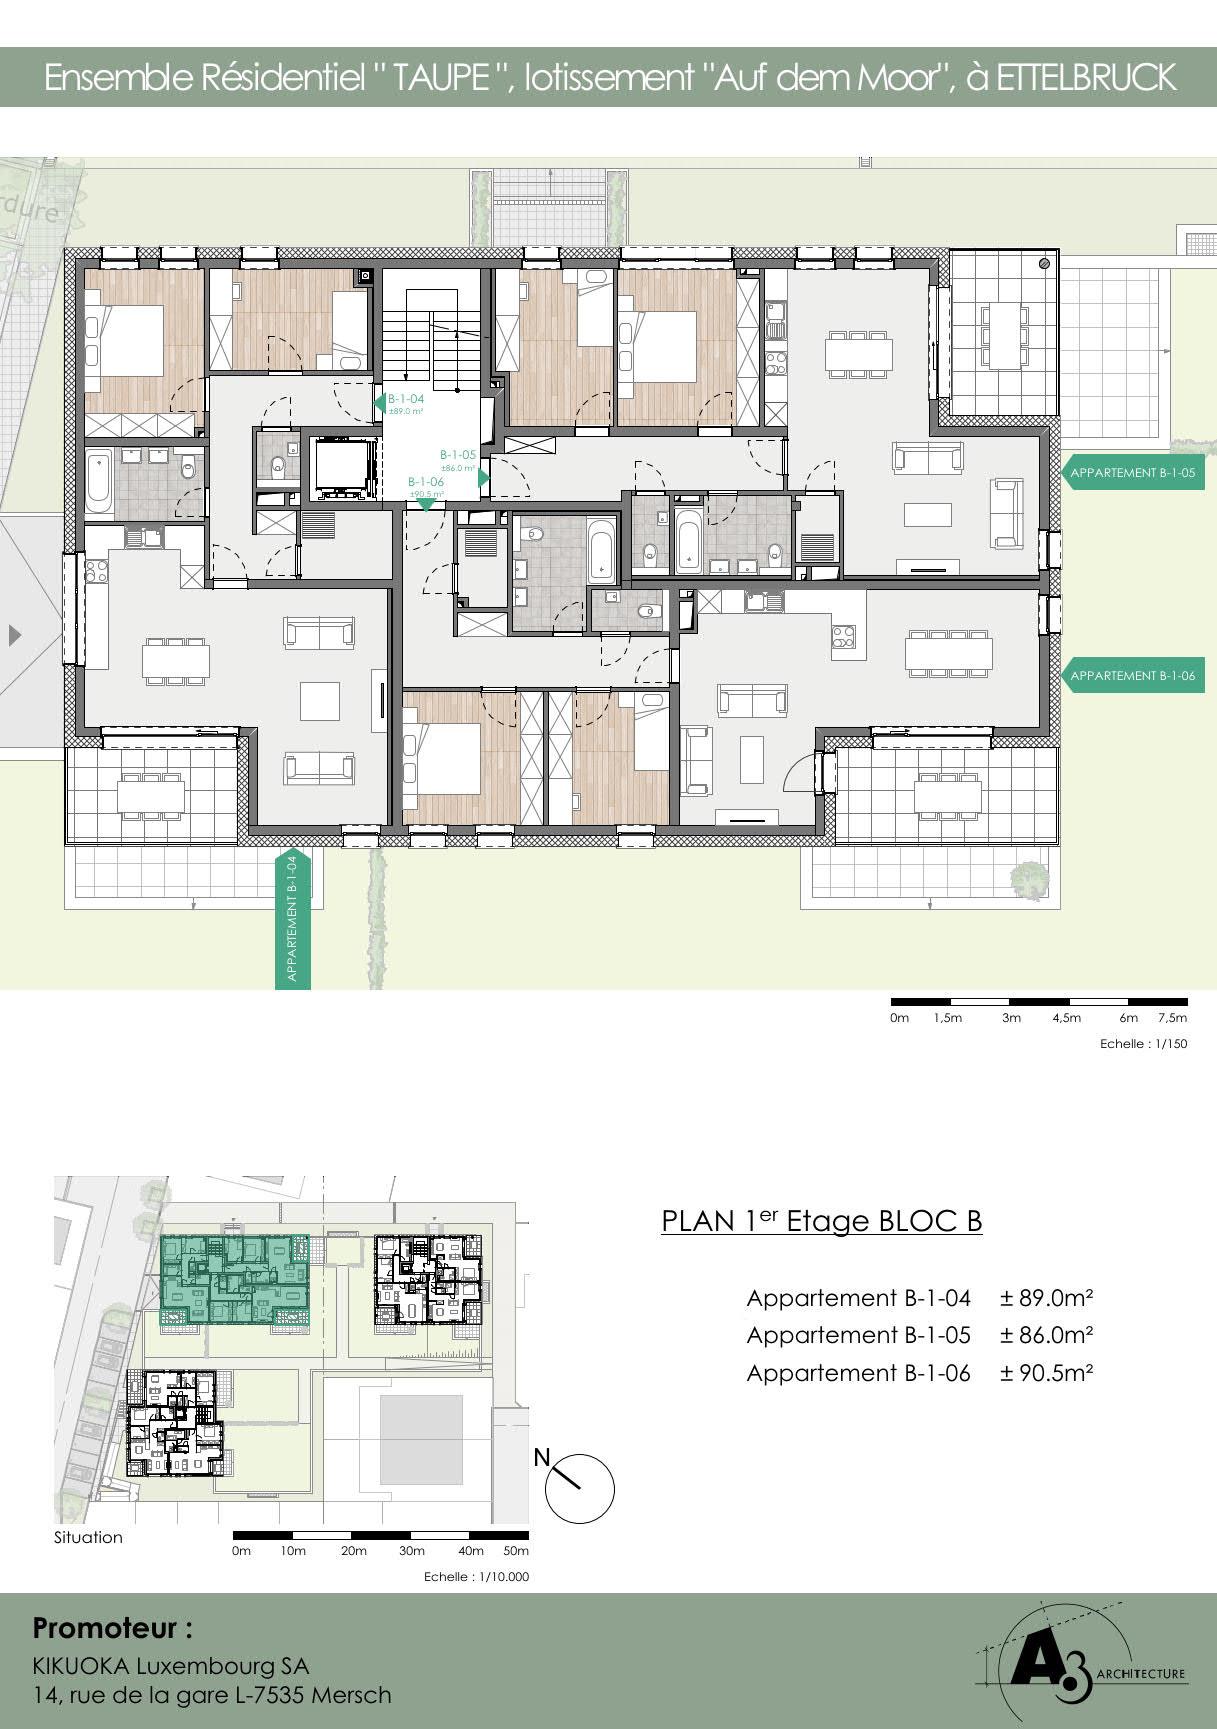 Bloc B: Etage 1